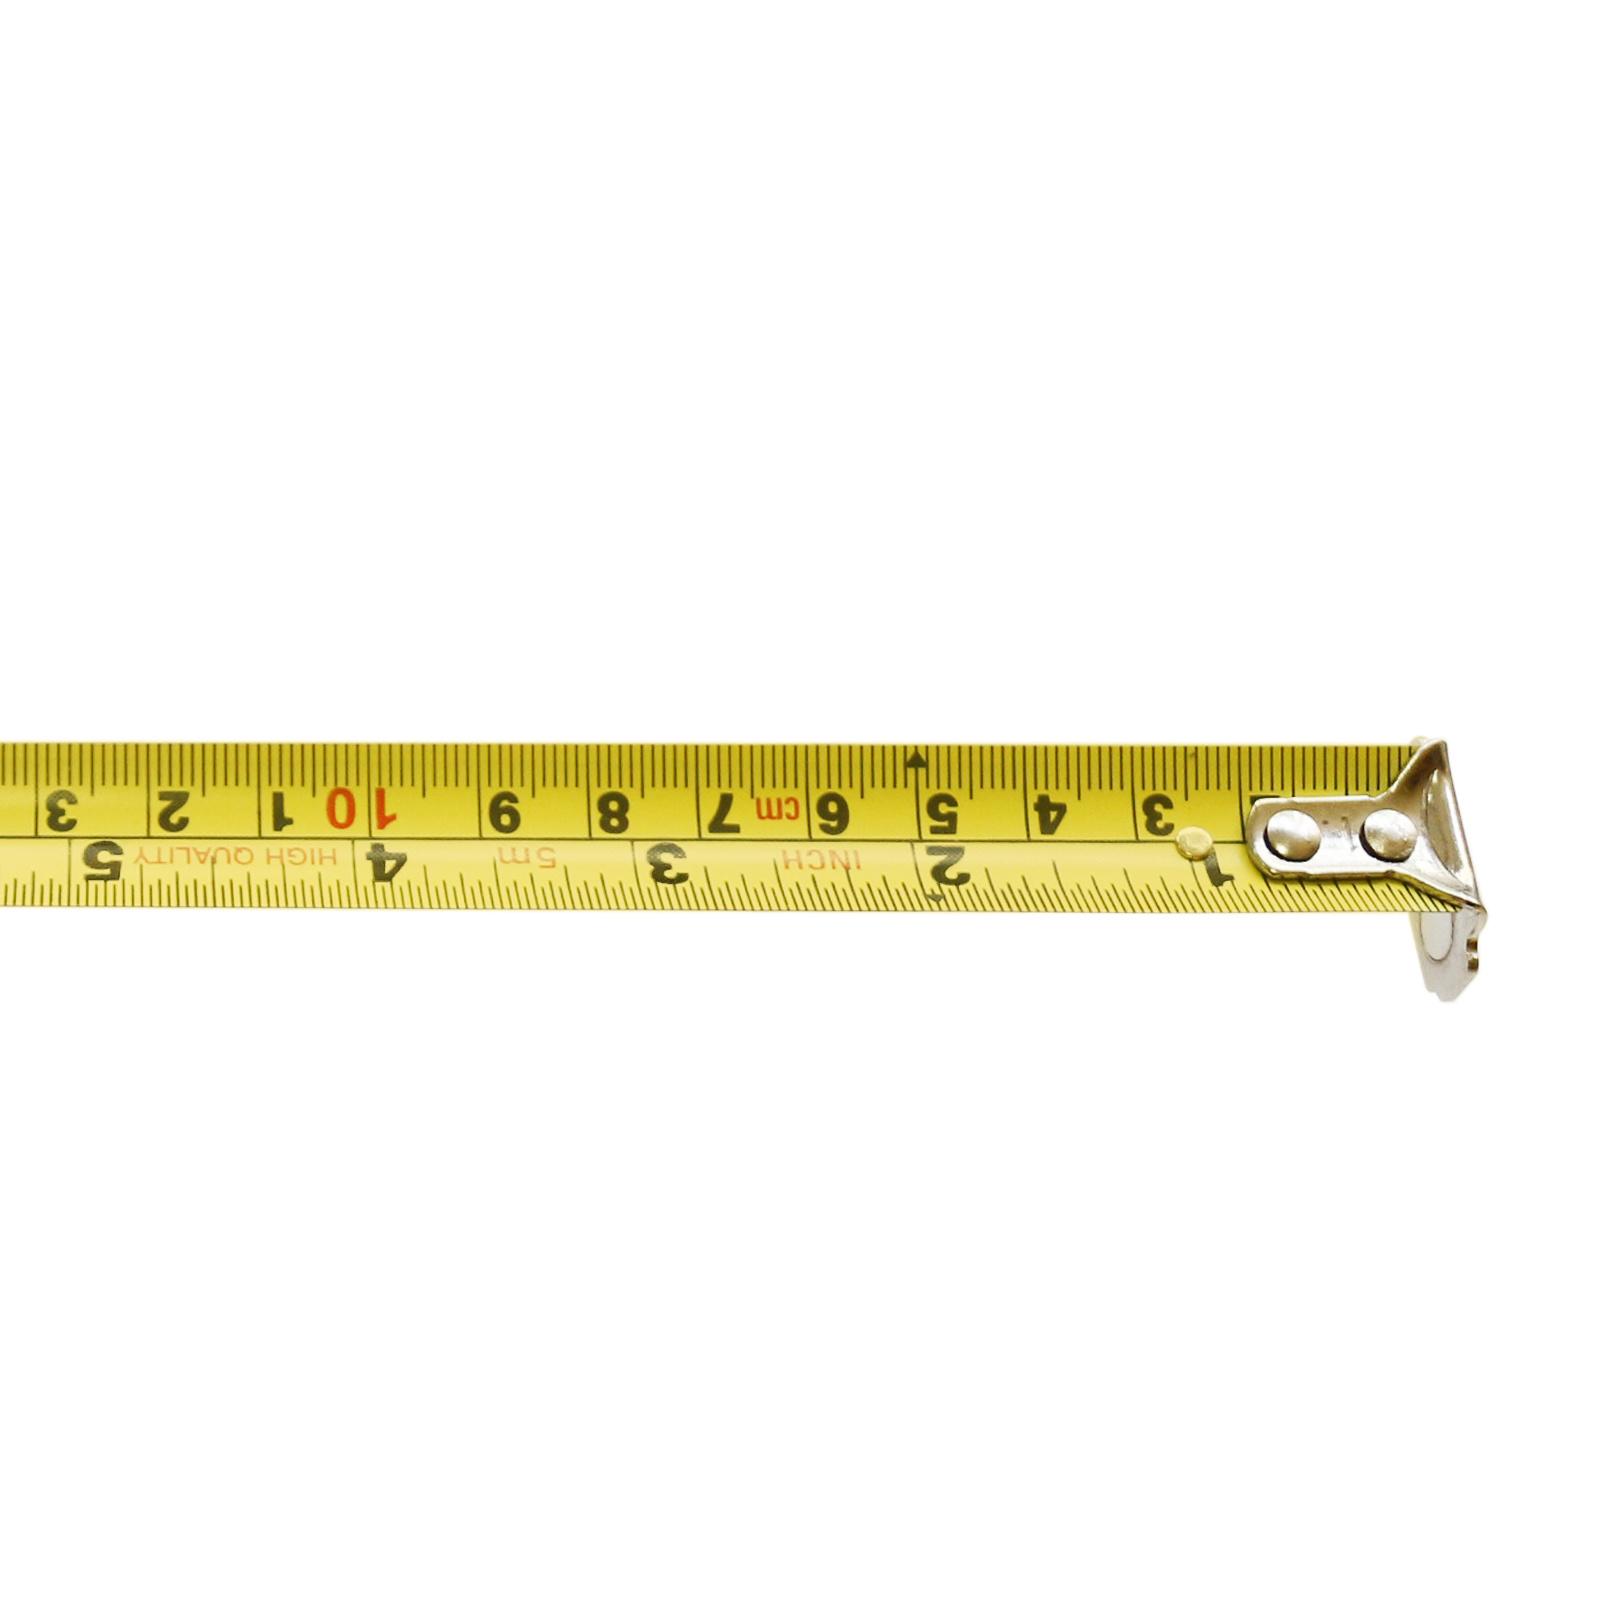 5m Auto Lock Steel Tape Measure with Nylon Coated Dual Blade